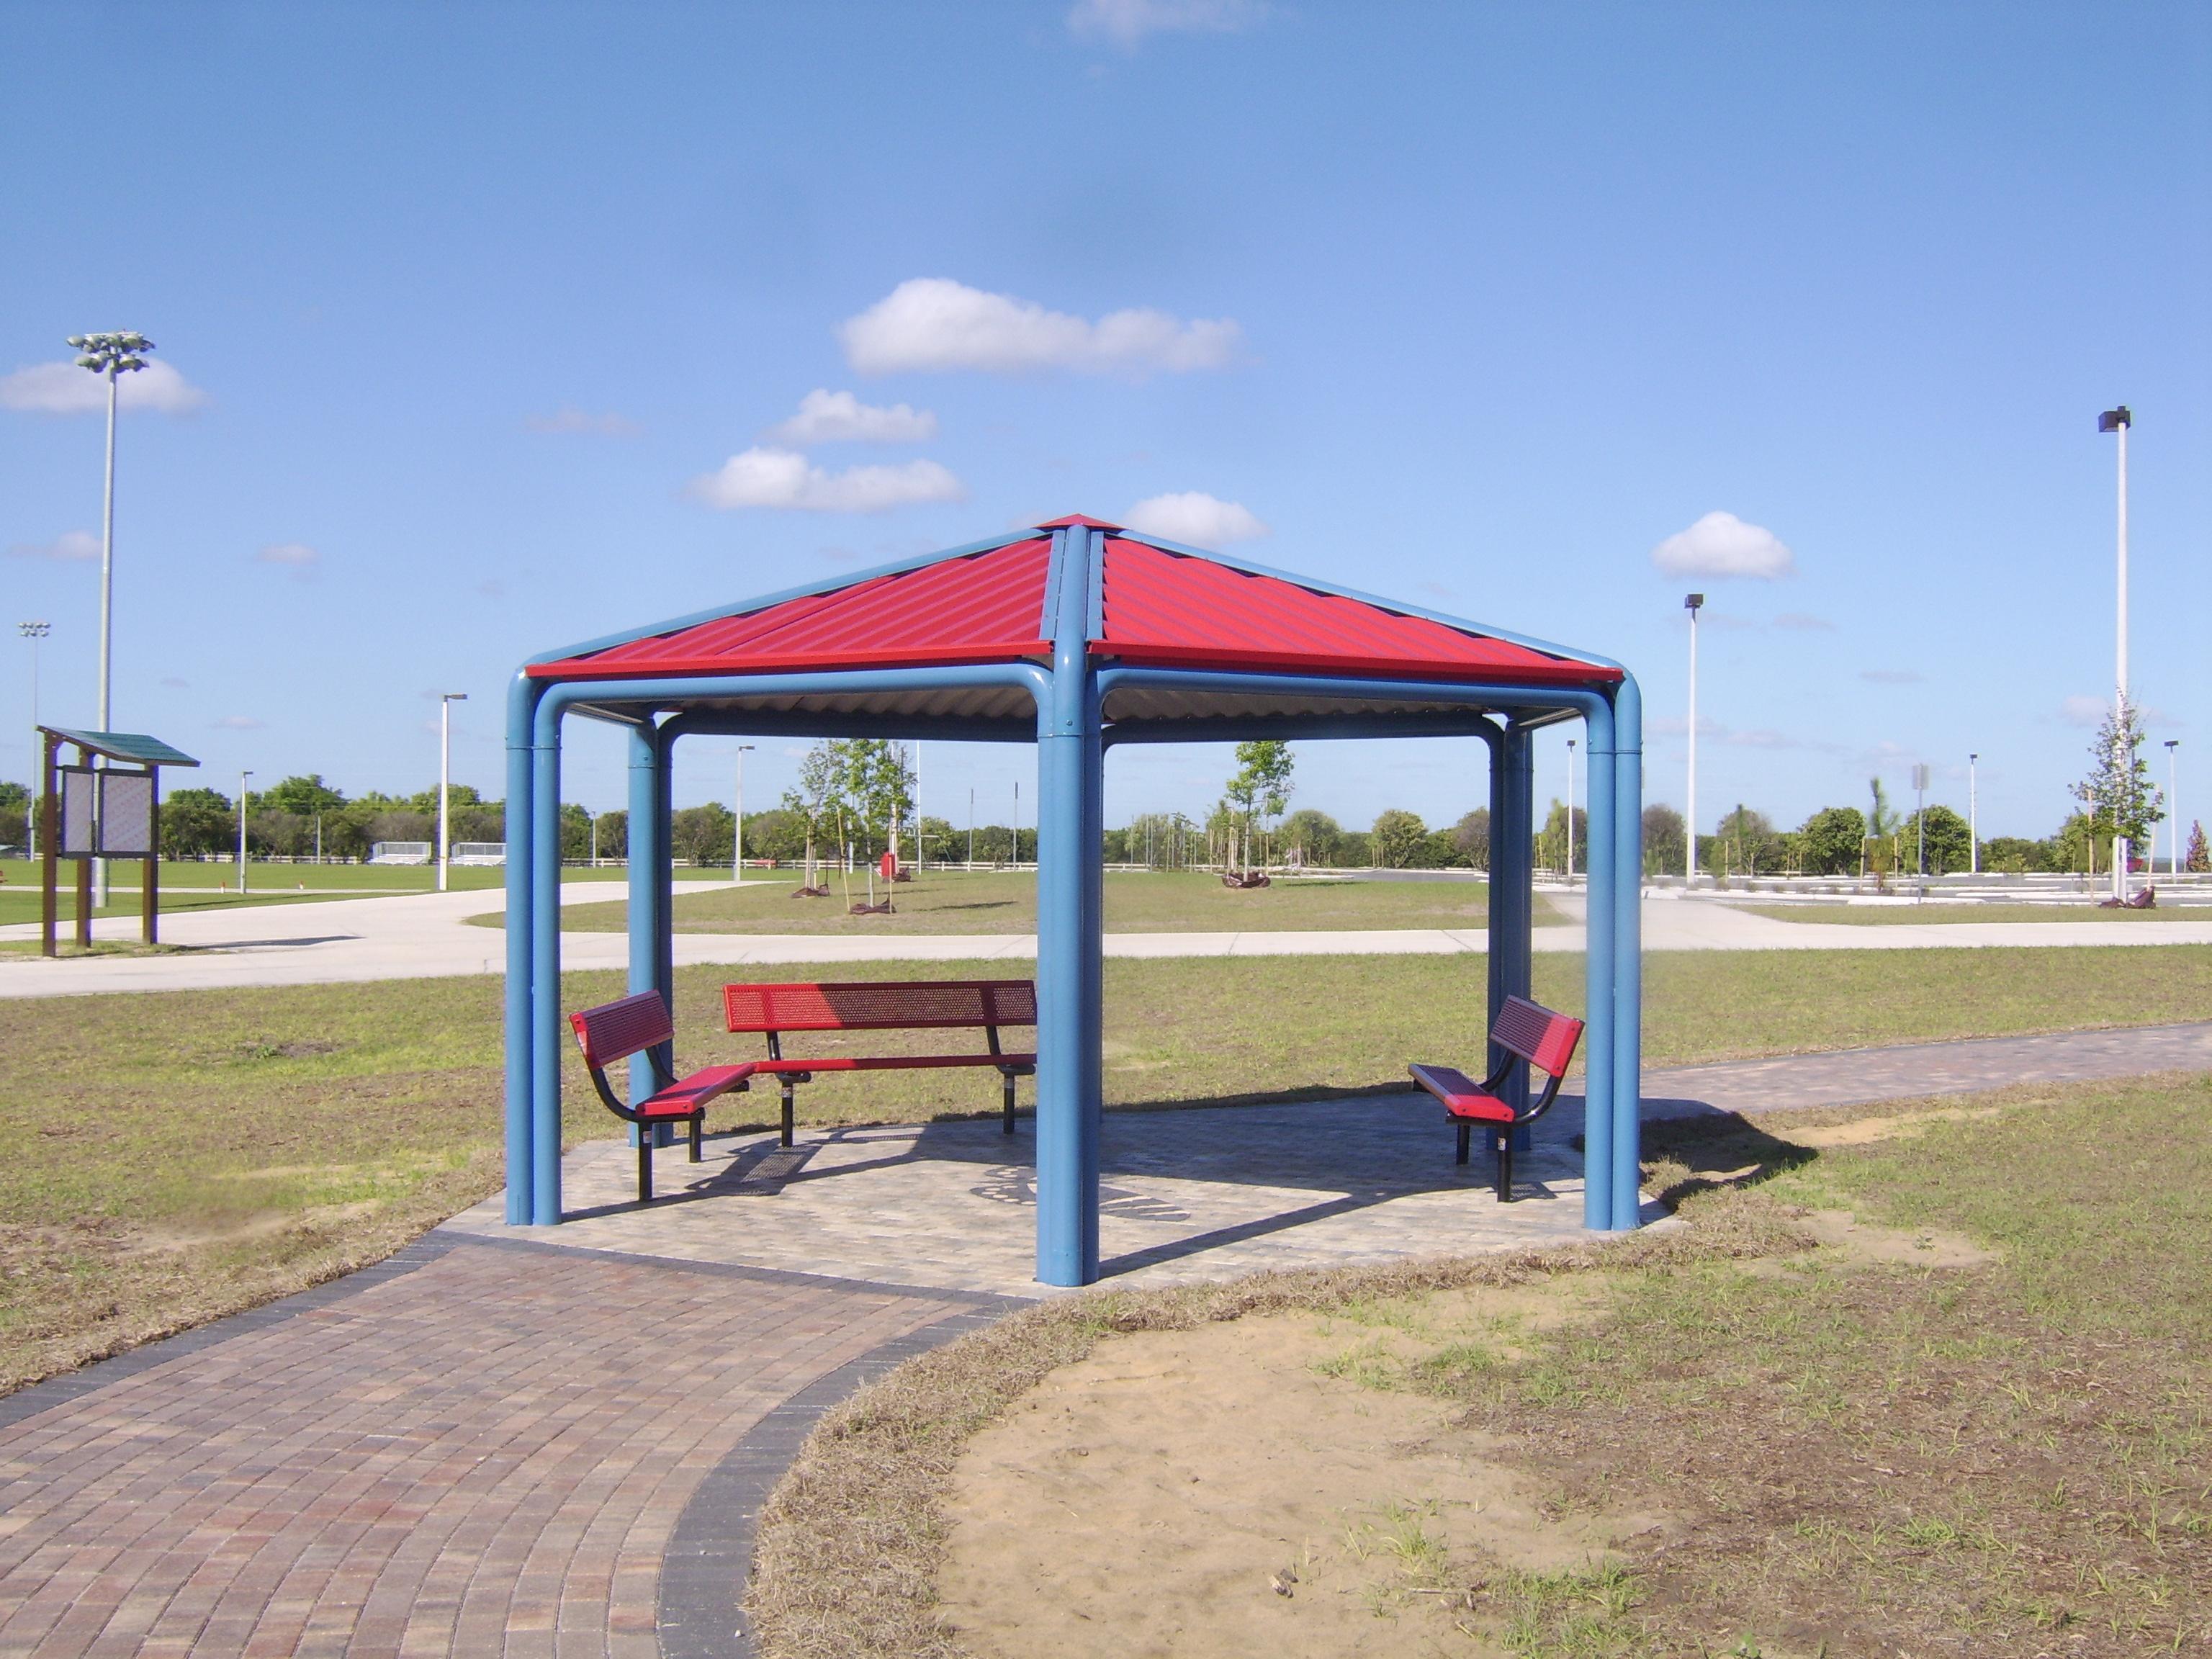 Prescott shade shelter